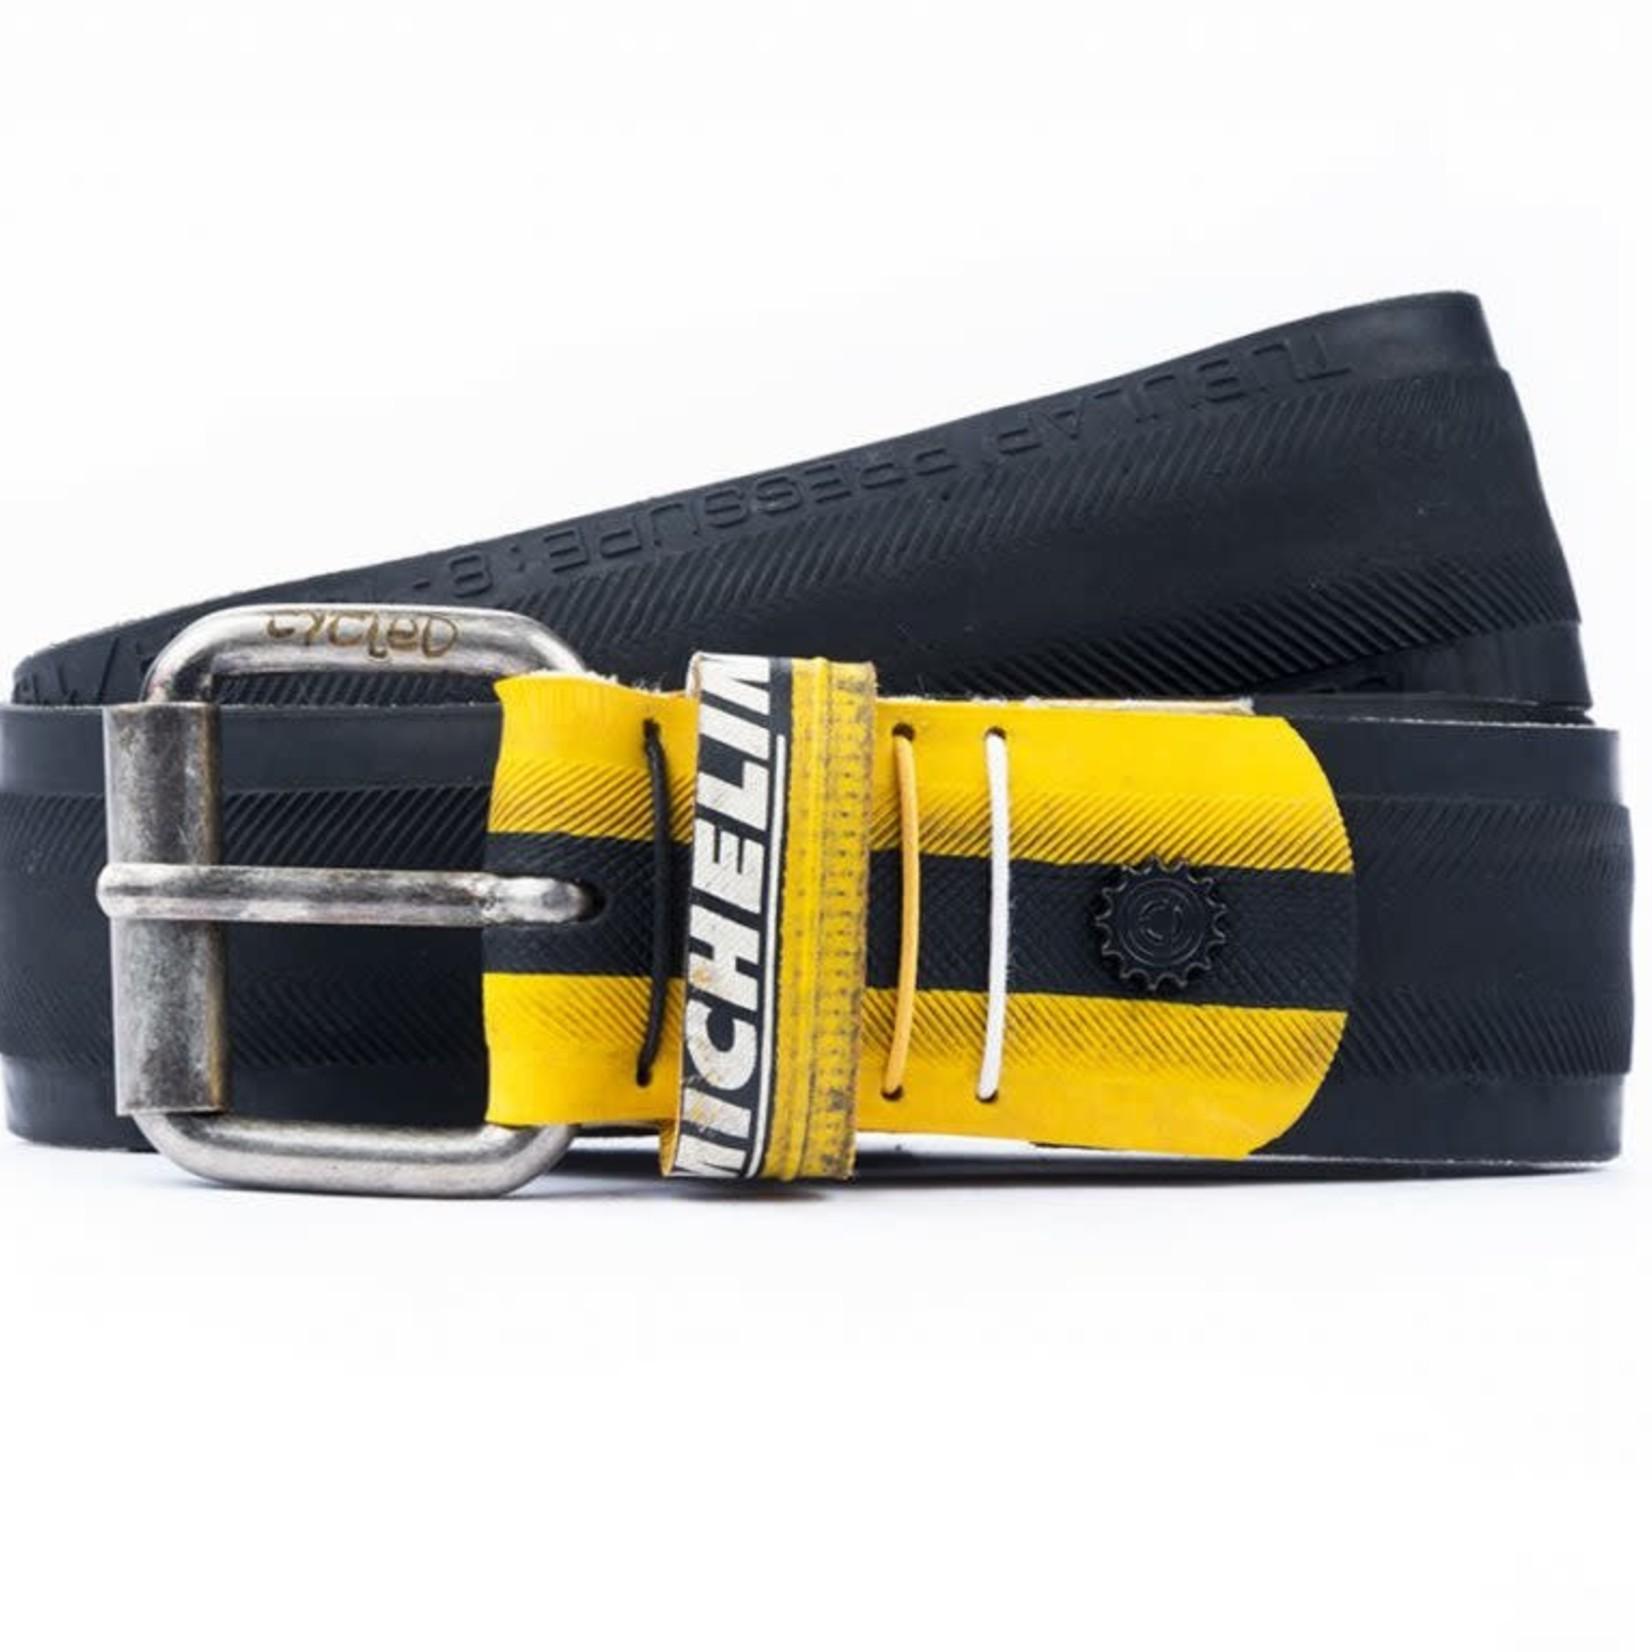 Cycled classica zwart + geel Michelin